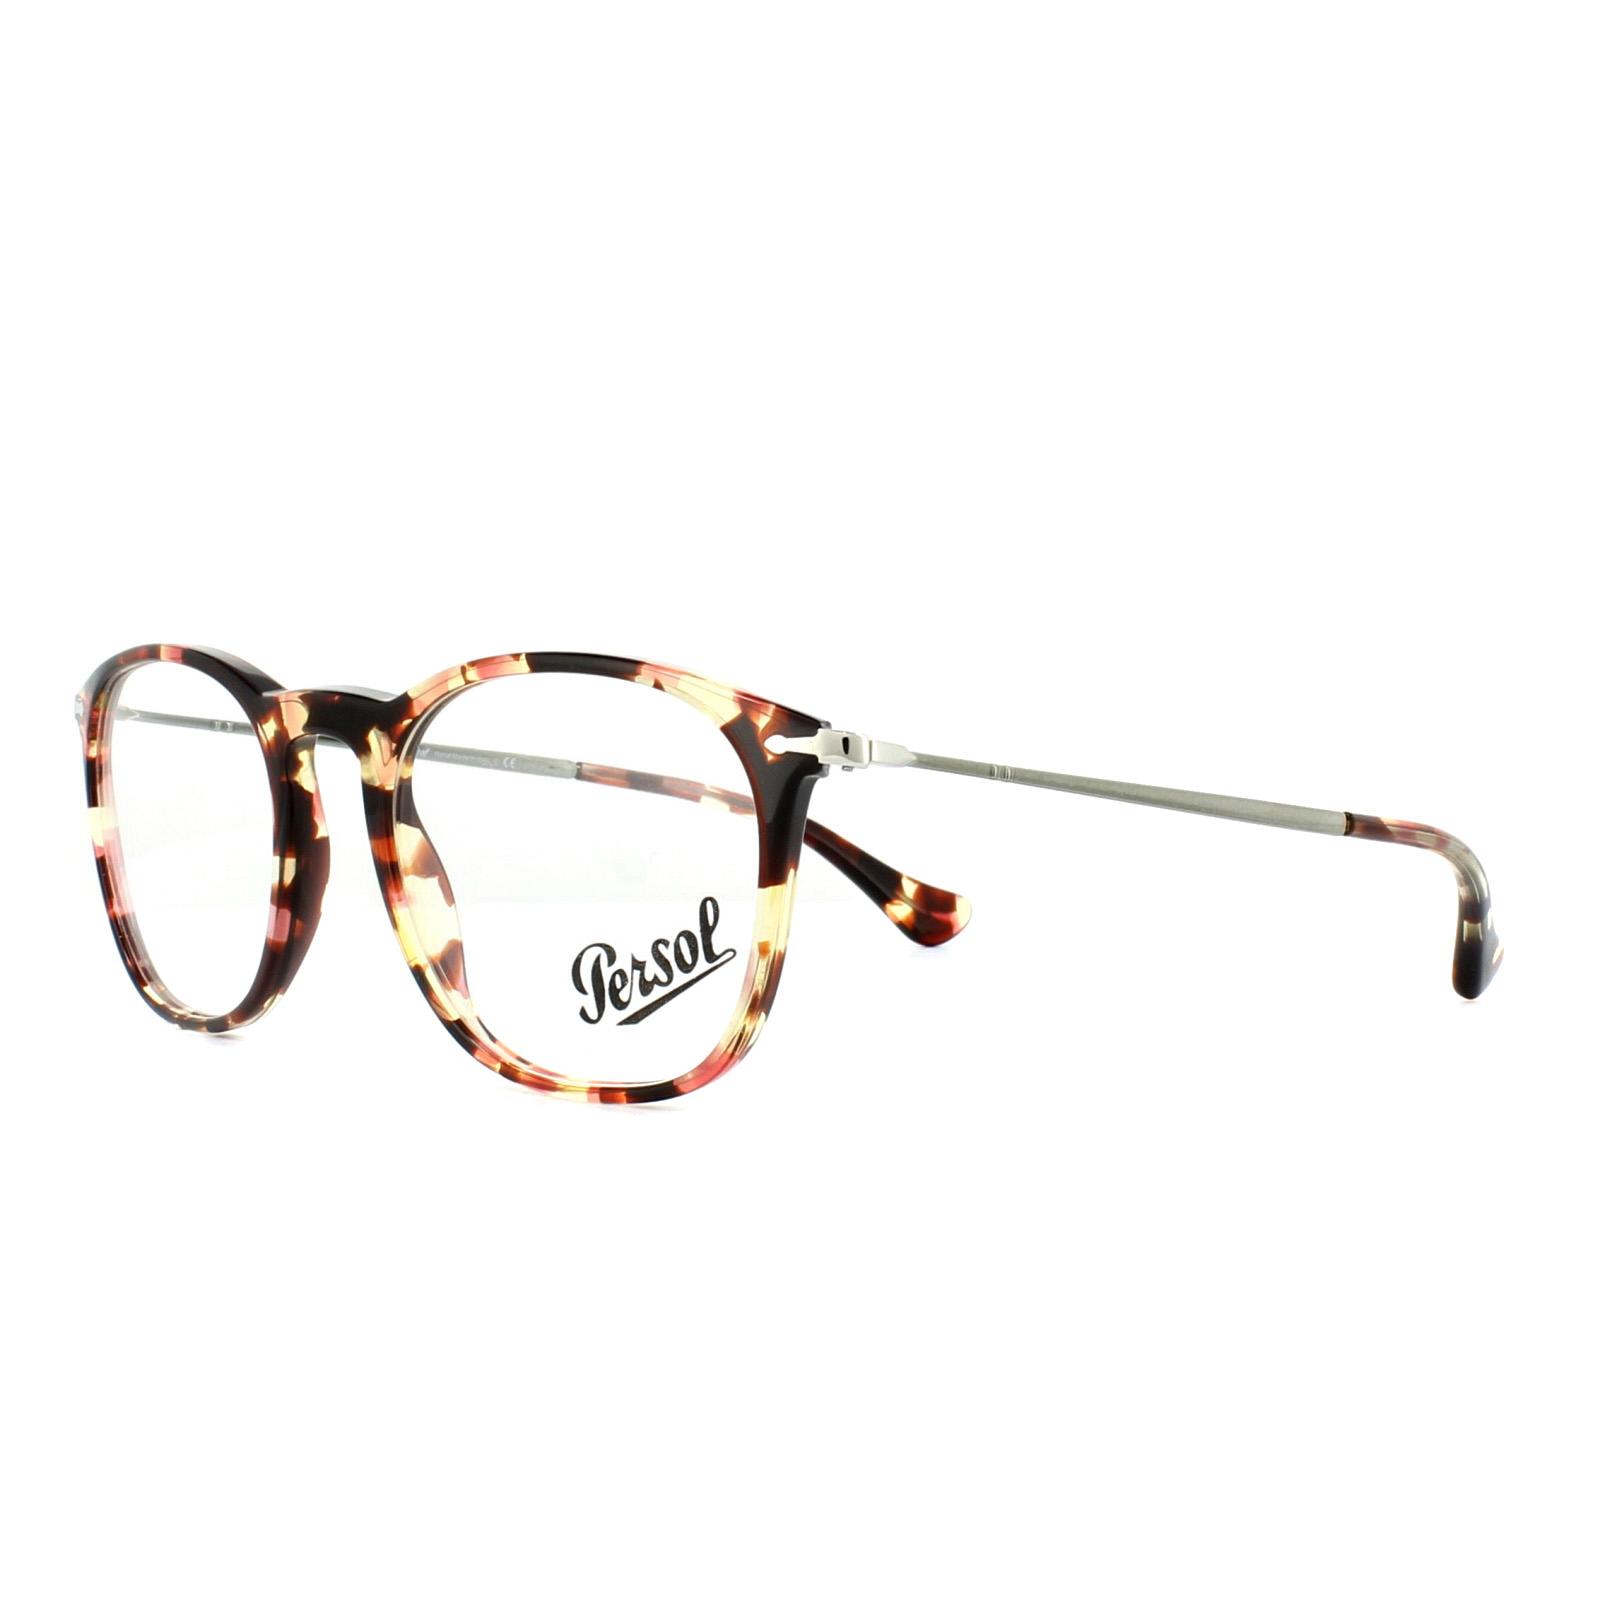 89d2159bbca Sentinel Persol Glasses Frames PO3124V 1059 Havana Rose Brown 48mm Mens